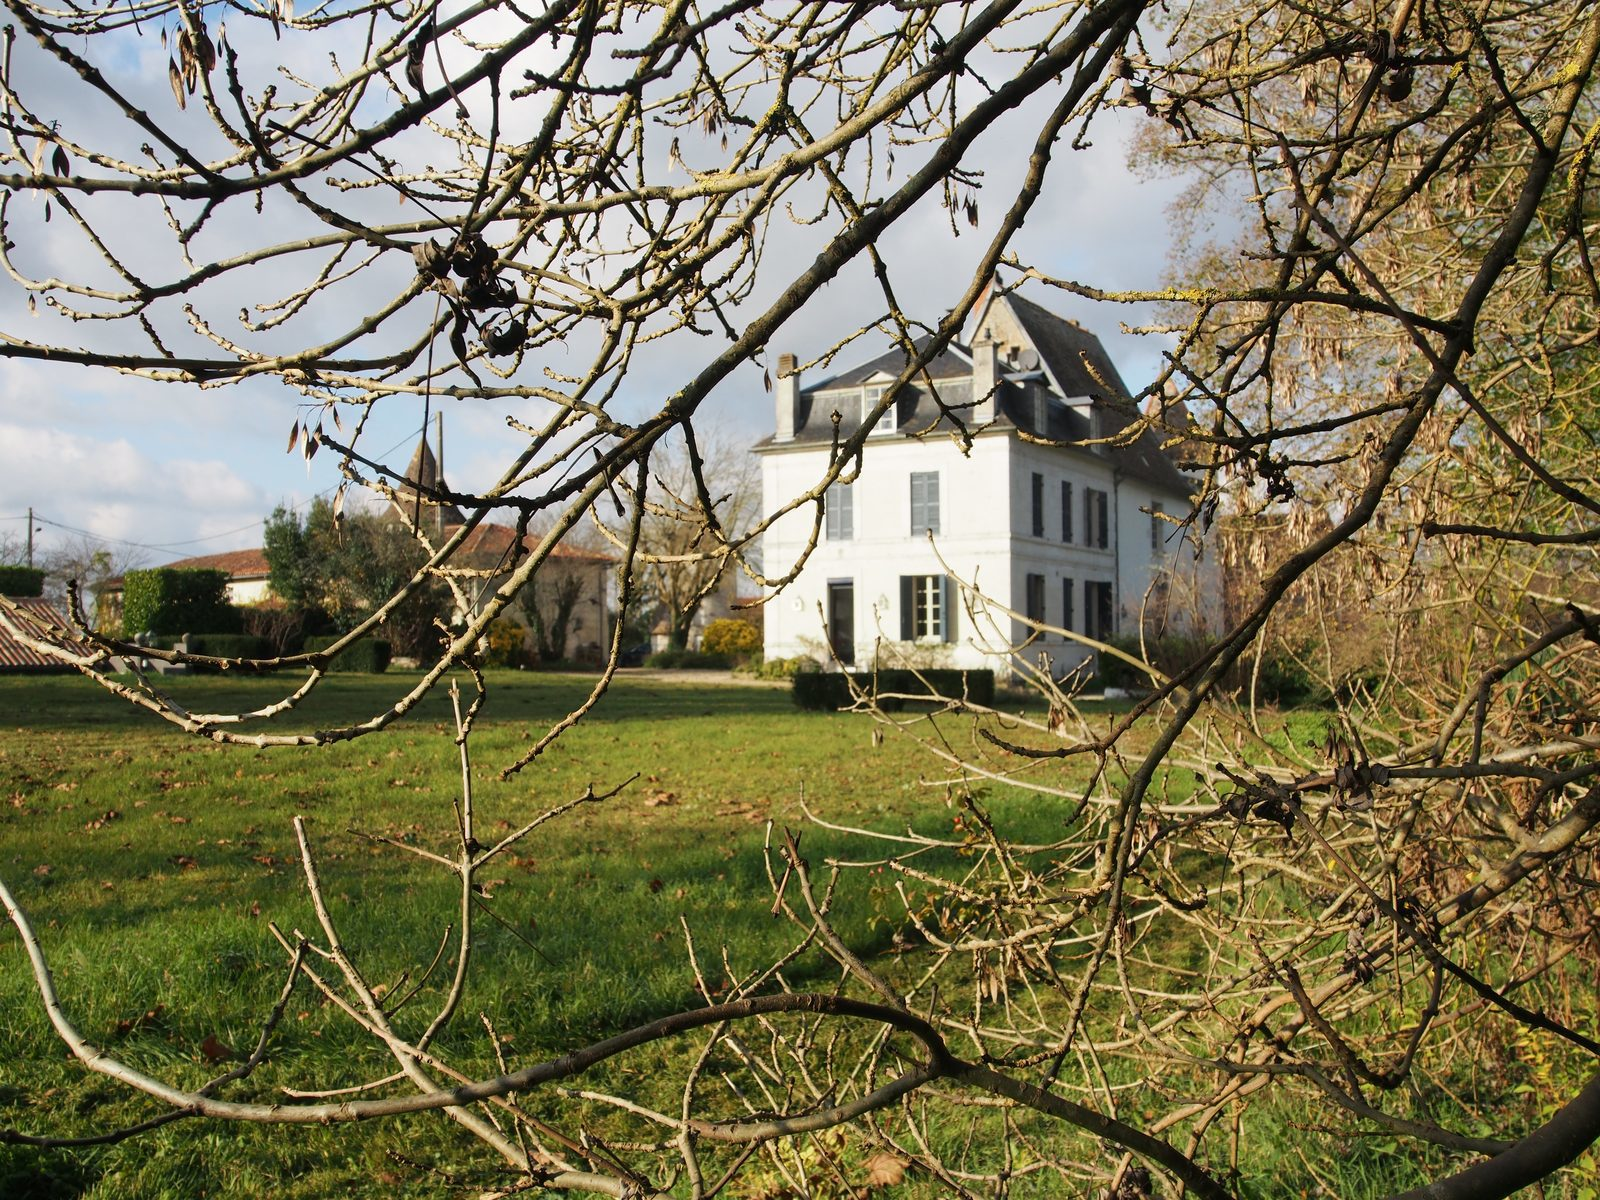 Frankrijk, Dordogne, Chenaud, vakantiehuizen, luxe, familie